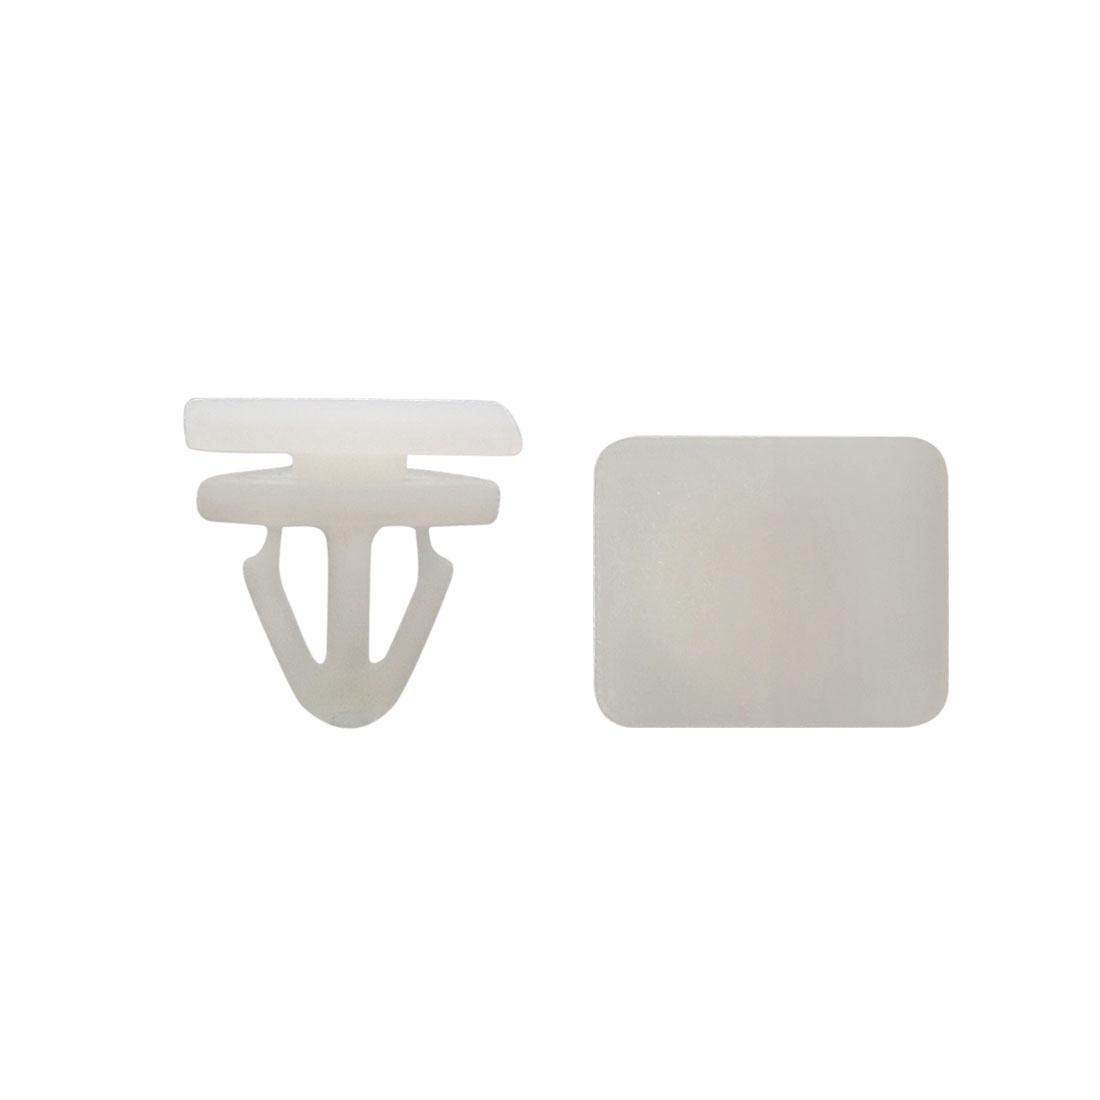 Universal Car Plastic Rivet Bumper Trim Panel Clips Retainer White 10mm 40Pcs